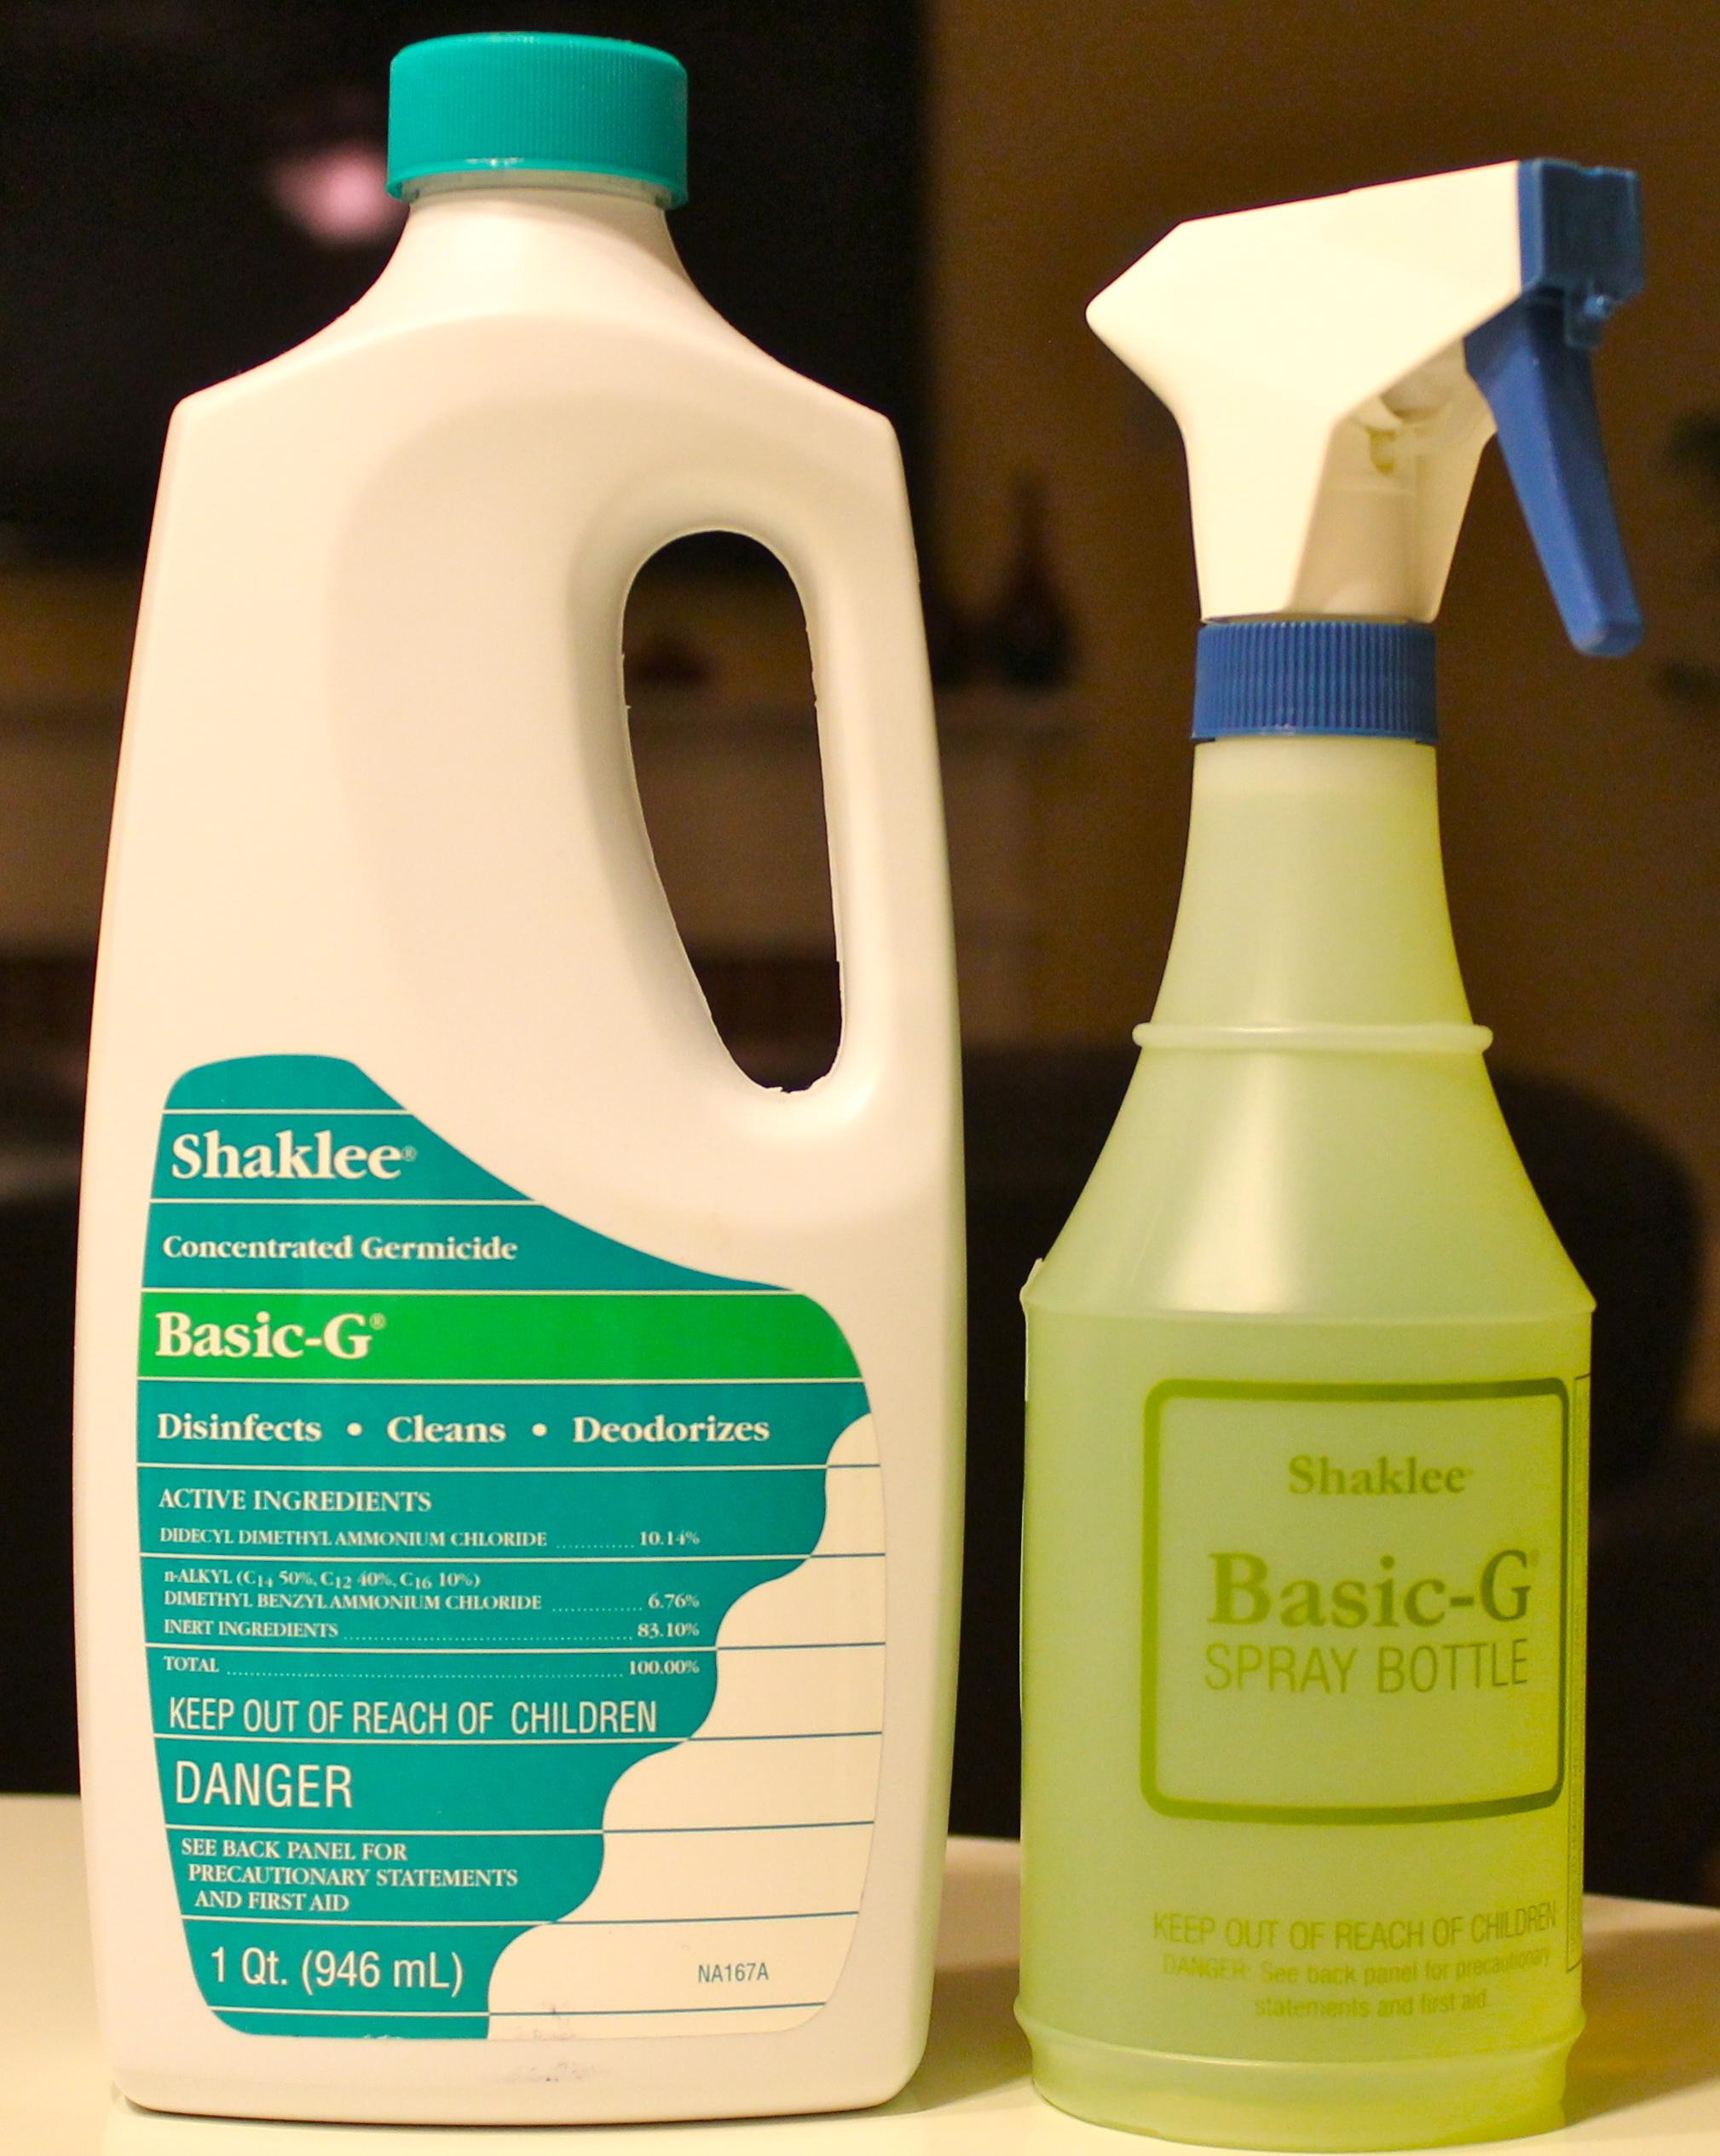 Accidently Inhaled Clorine Spray In Small Bathroom: Bring Mae Flowers